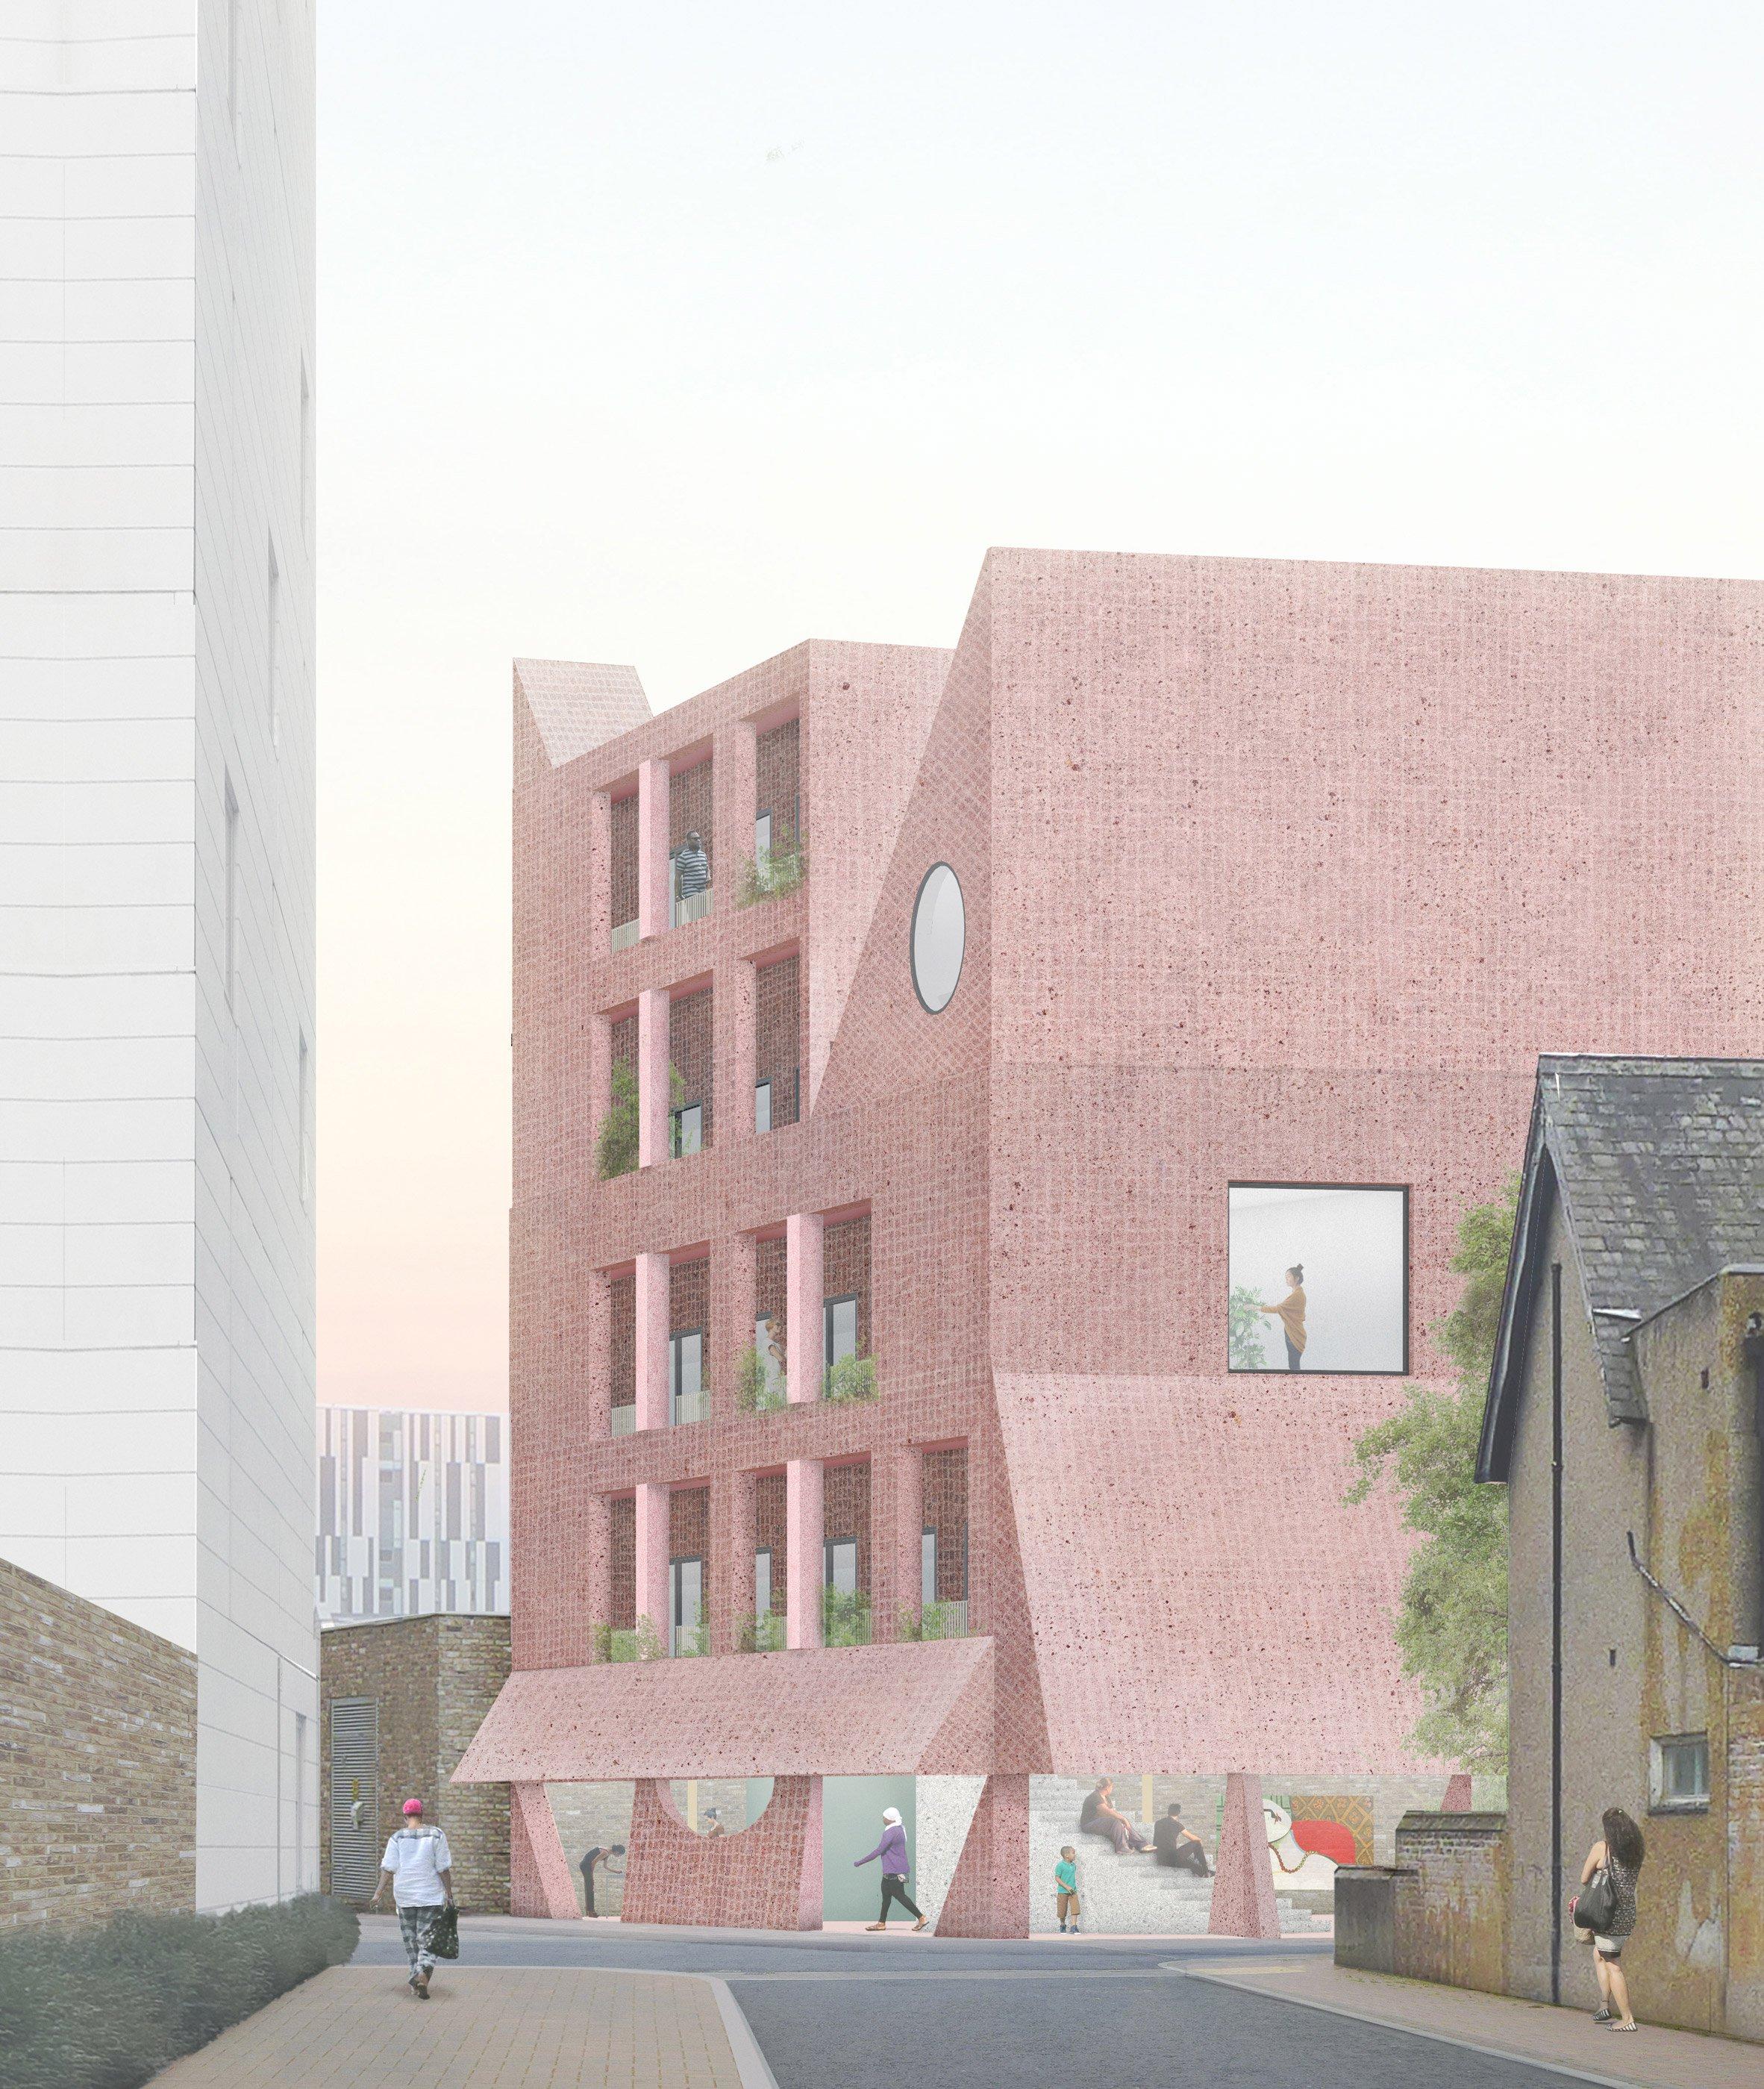 Bricks archives minimal blogs for Minimal house artists